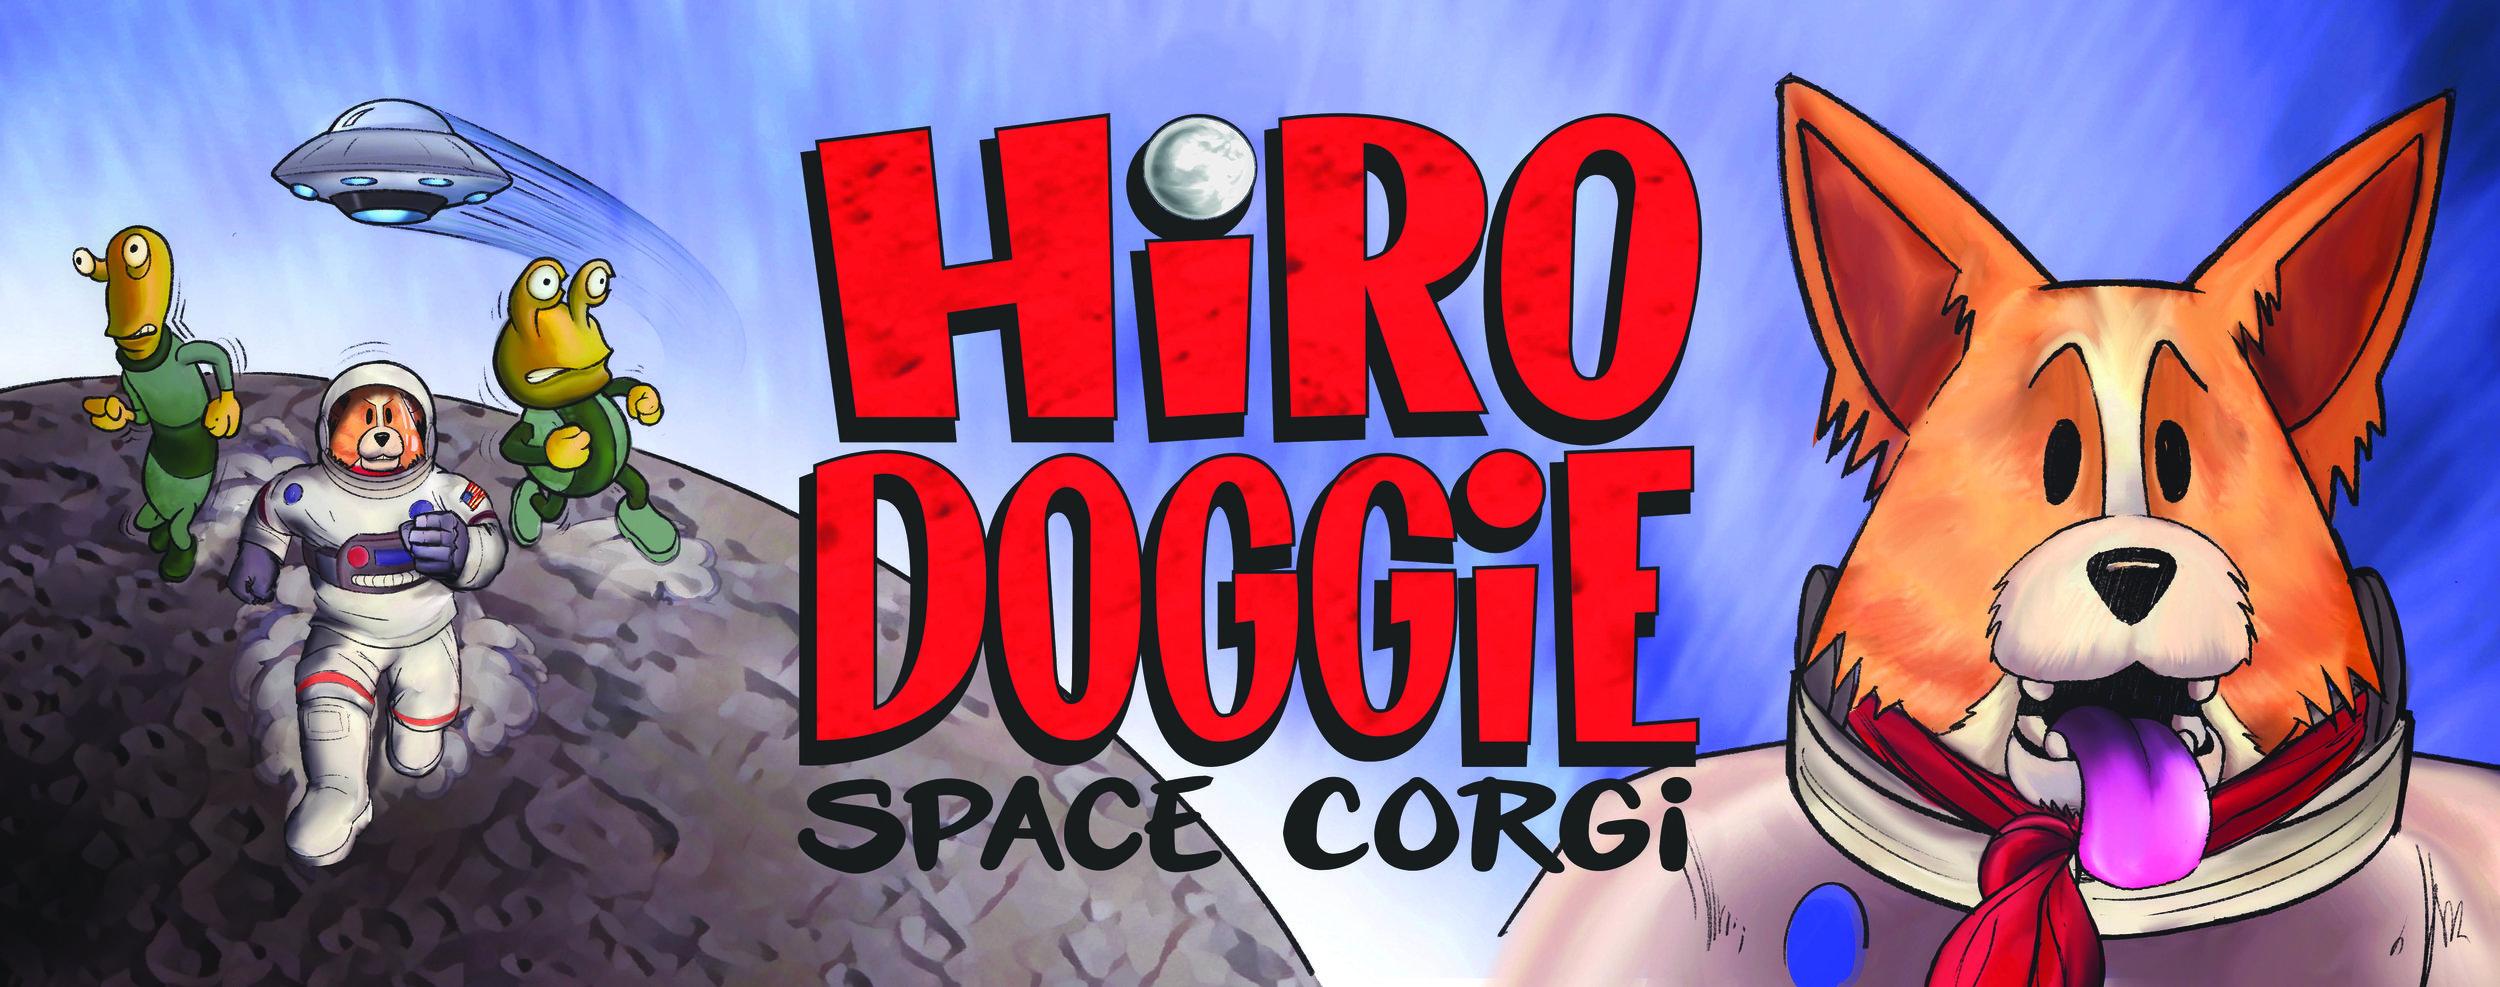 Hiro Doggie Space Corgi cover final.jpg